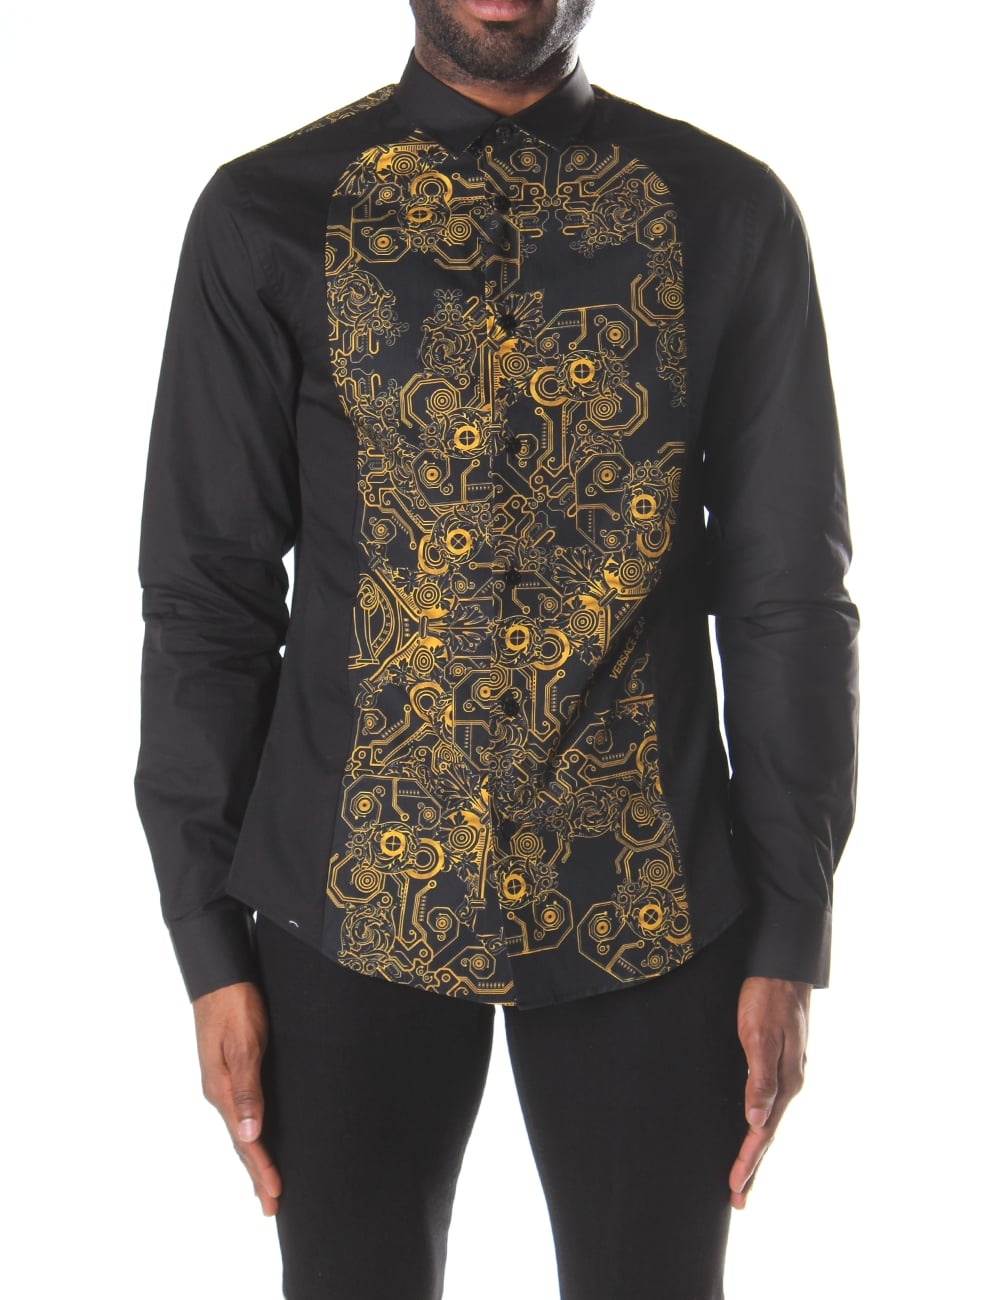 9c6537c824 Versace Jeans Men's Baroque Print Long Sleeve Shirt